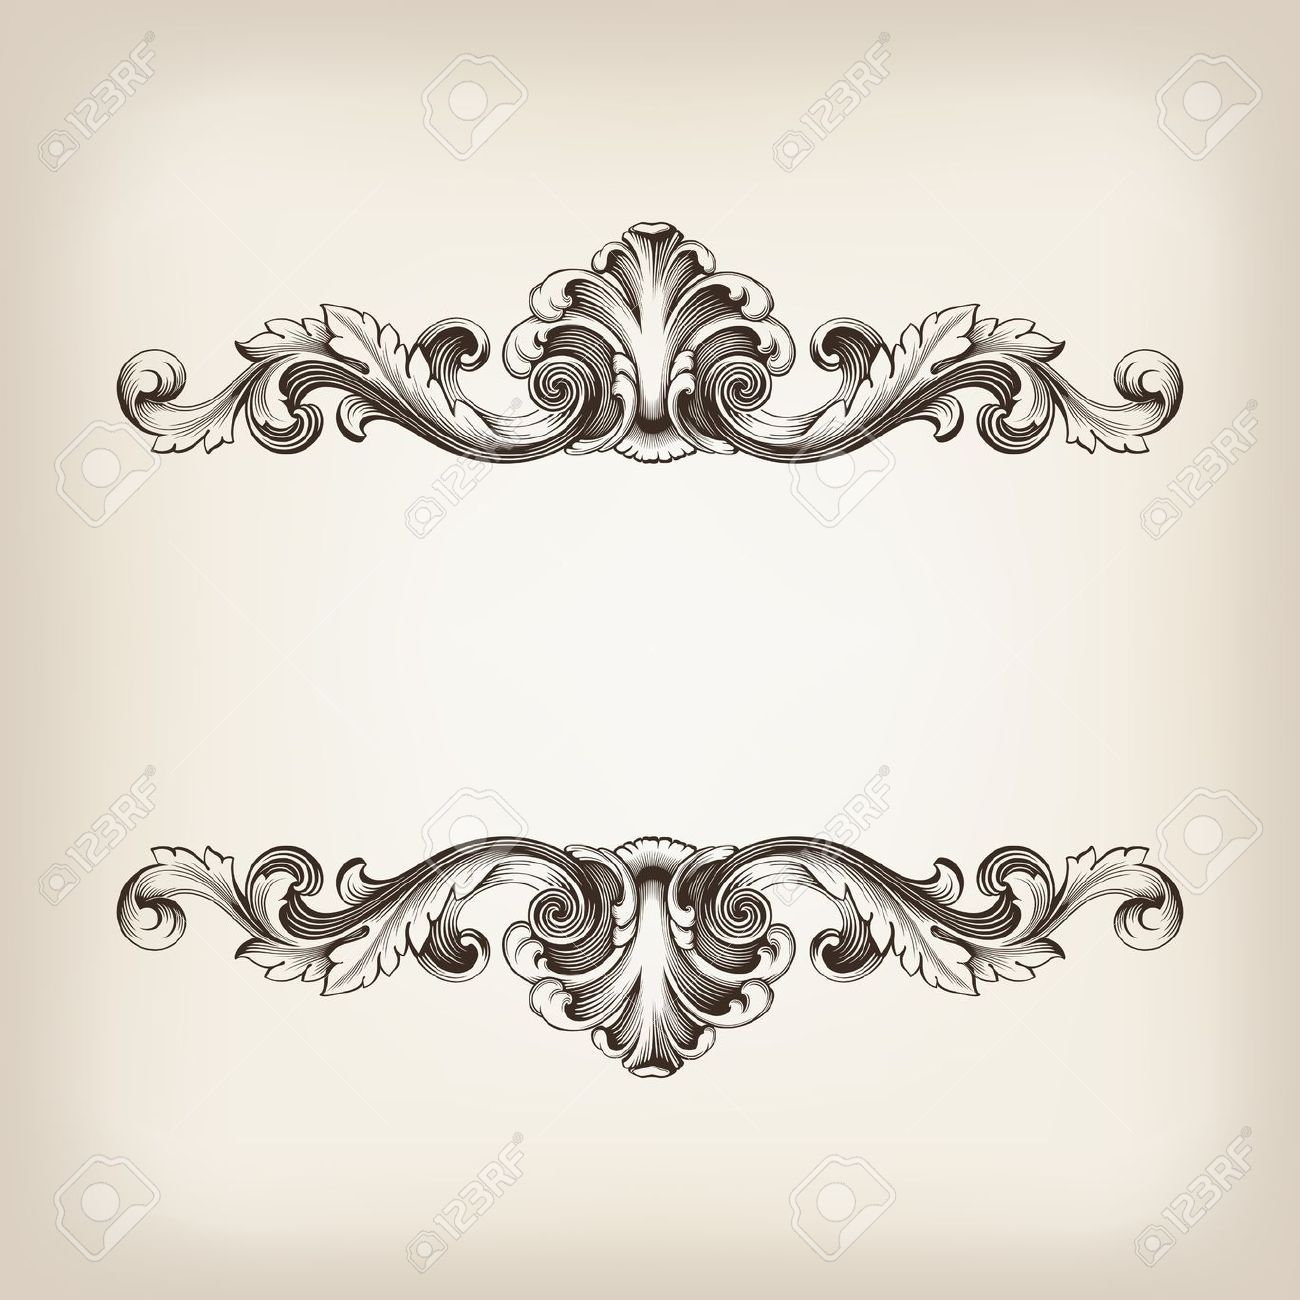 Vintage border frame filigree engraving with retro ornament | Pinterest